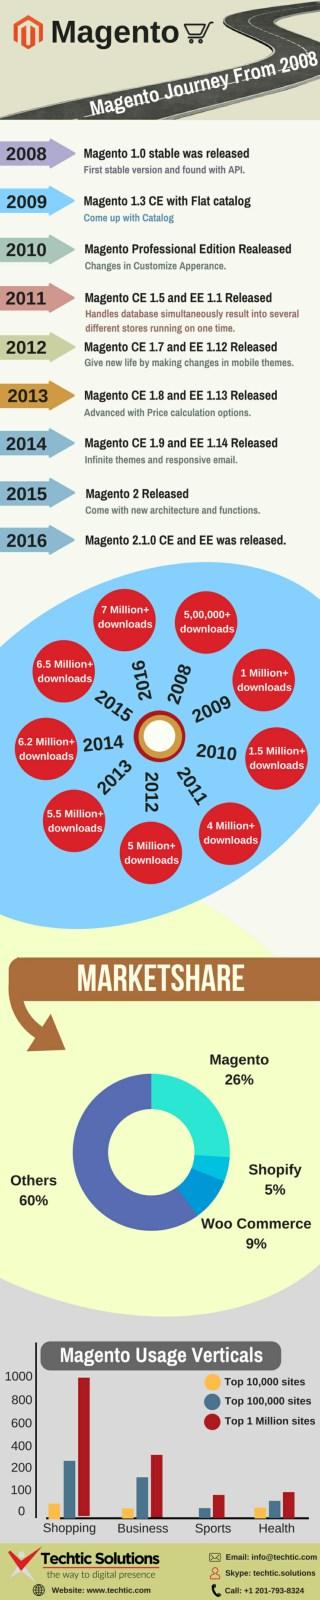 Magento Development Journey from 2008 – Techtic Solutions